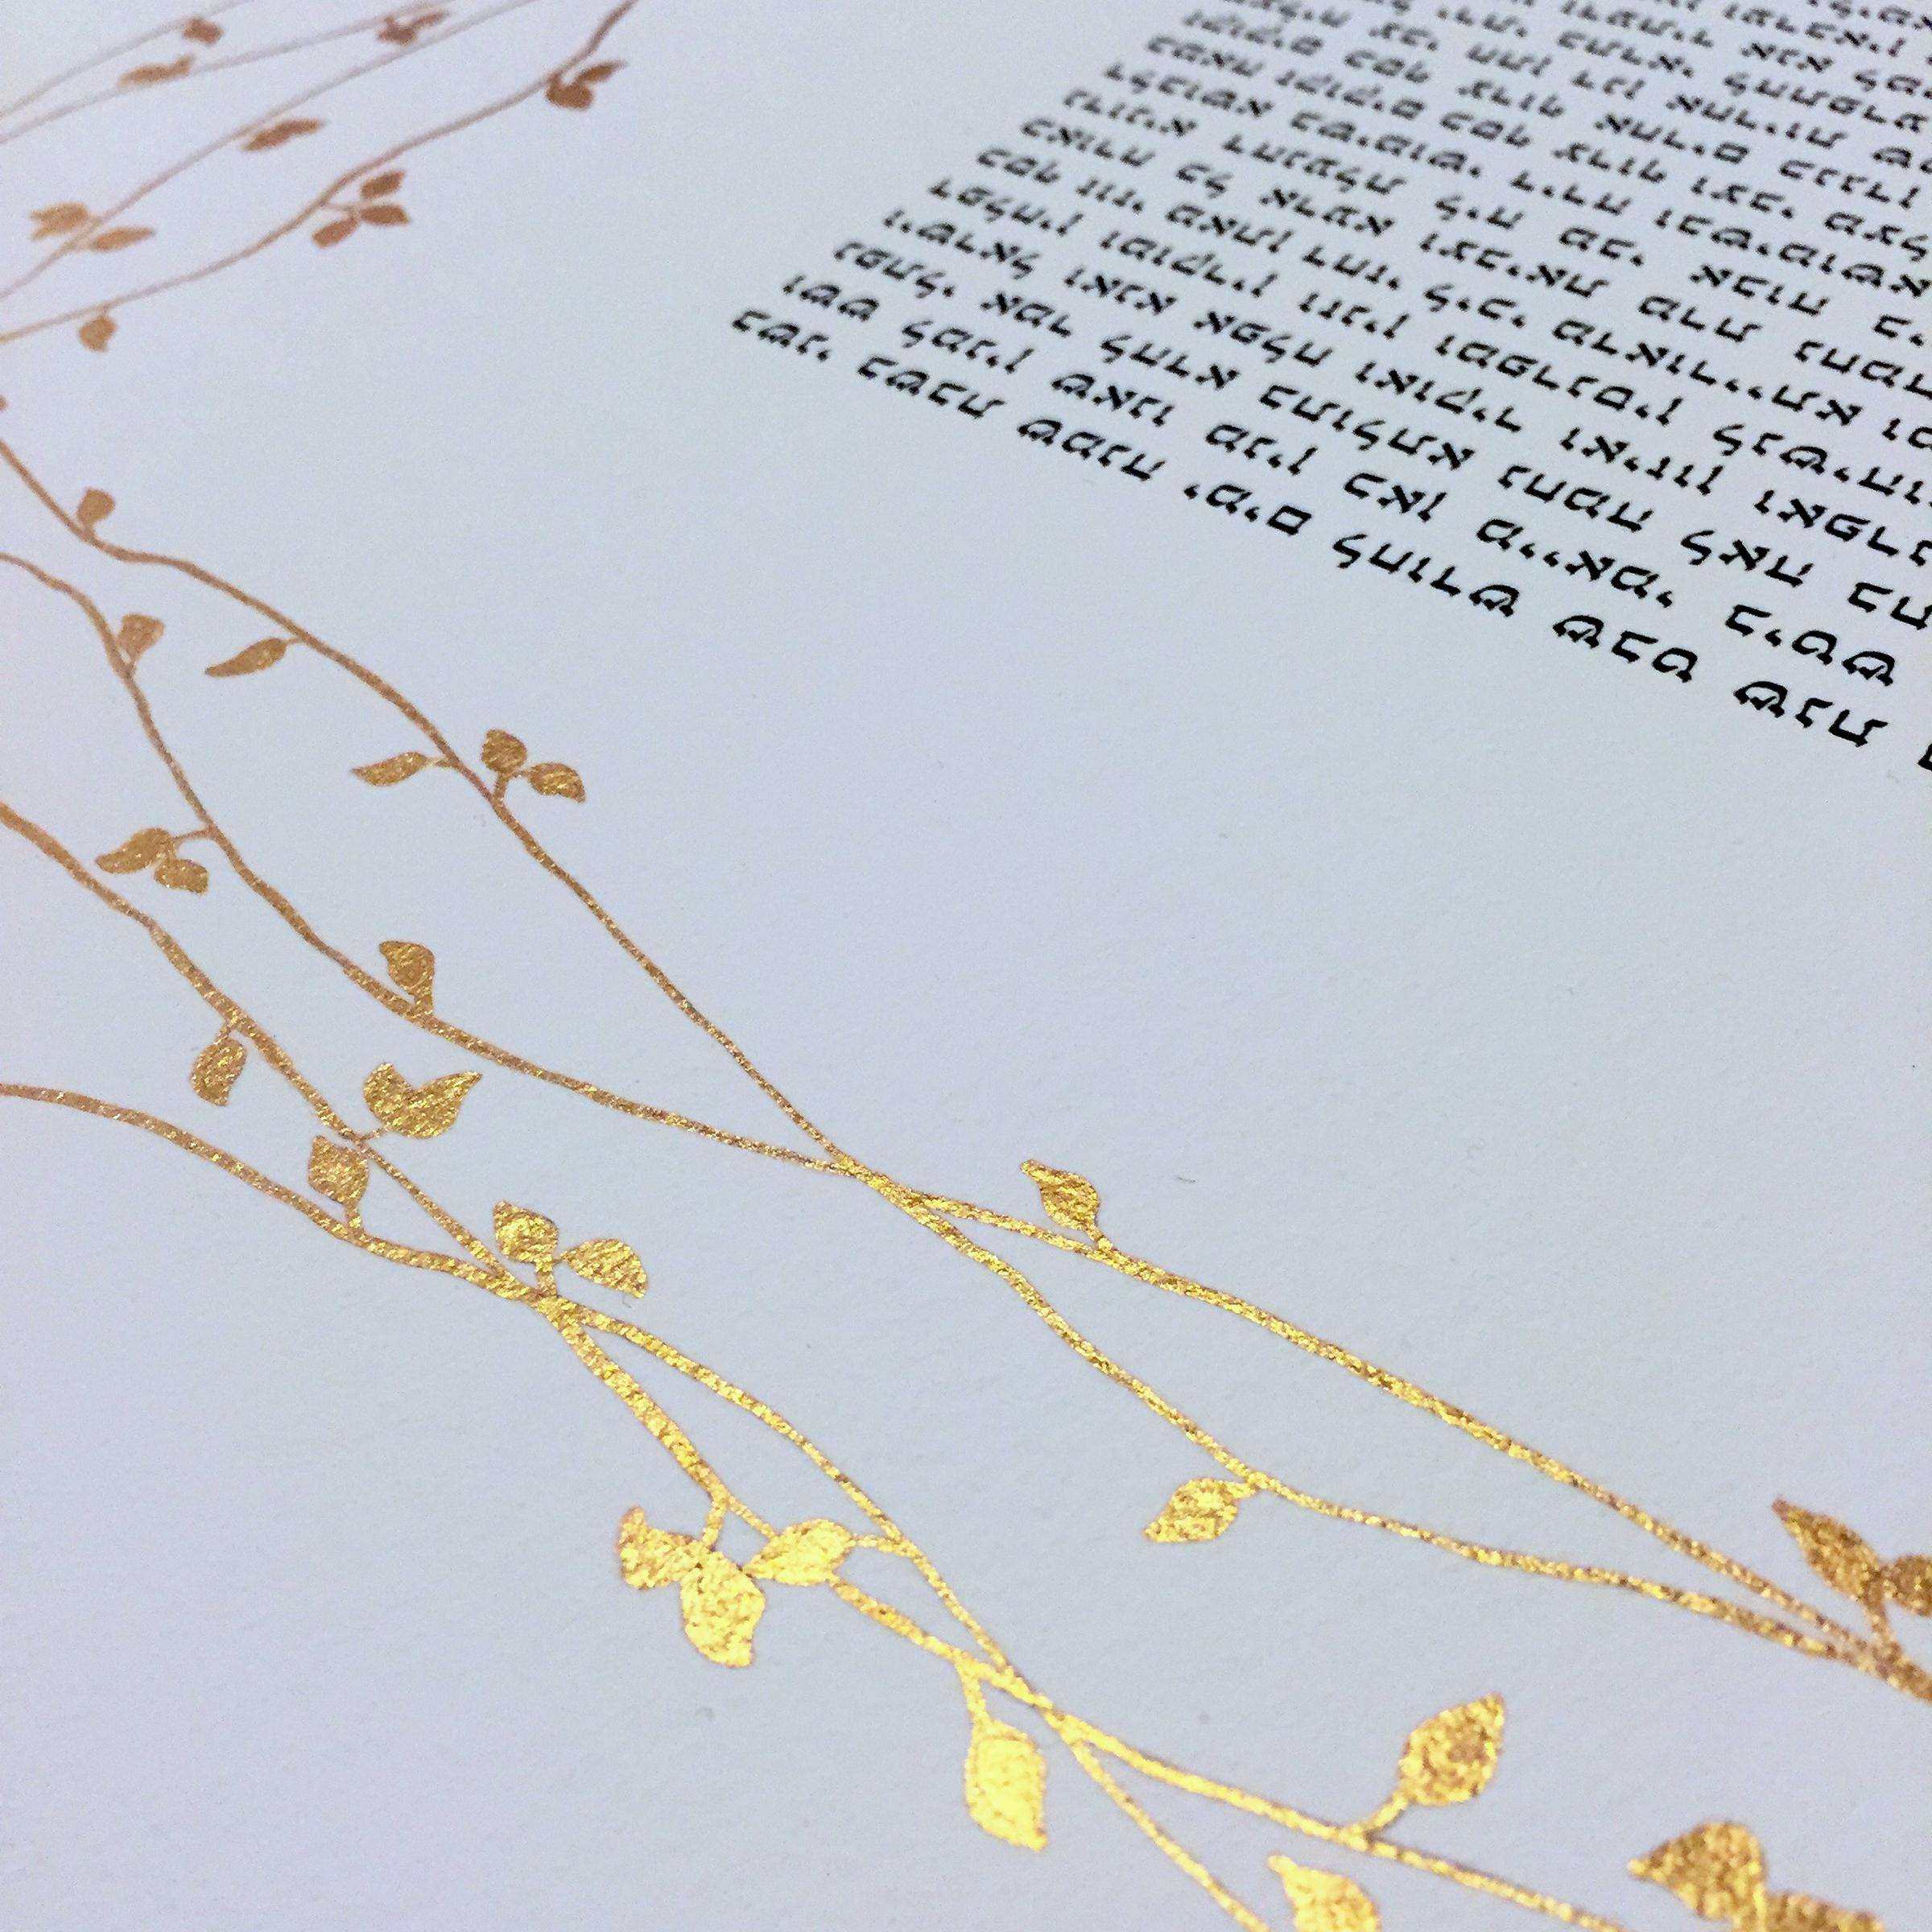 Original_Ketubah_Prints_by_MeiravOng